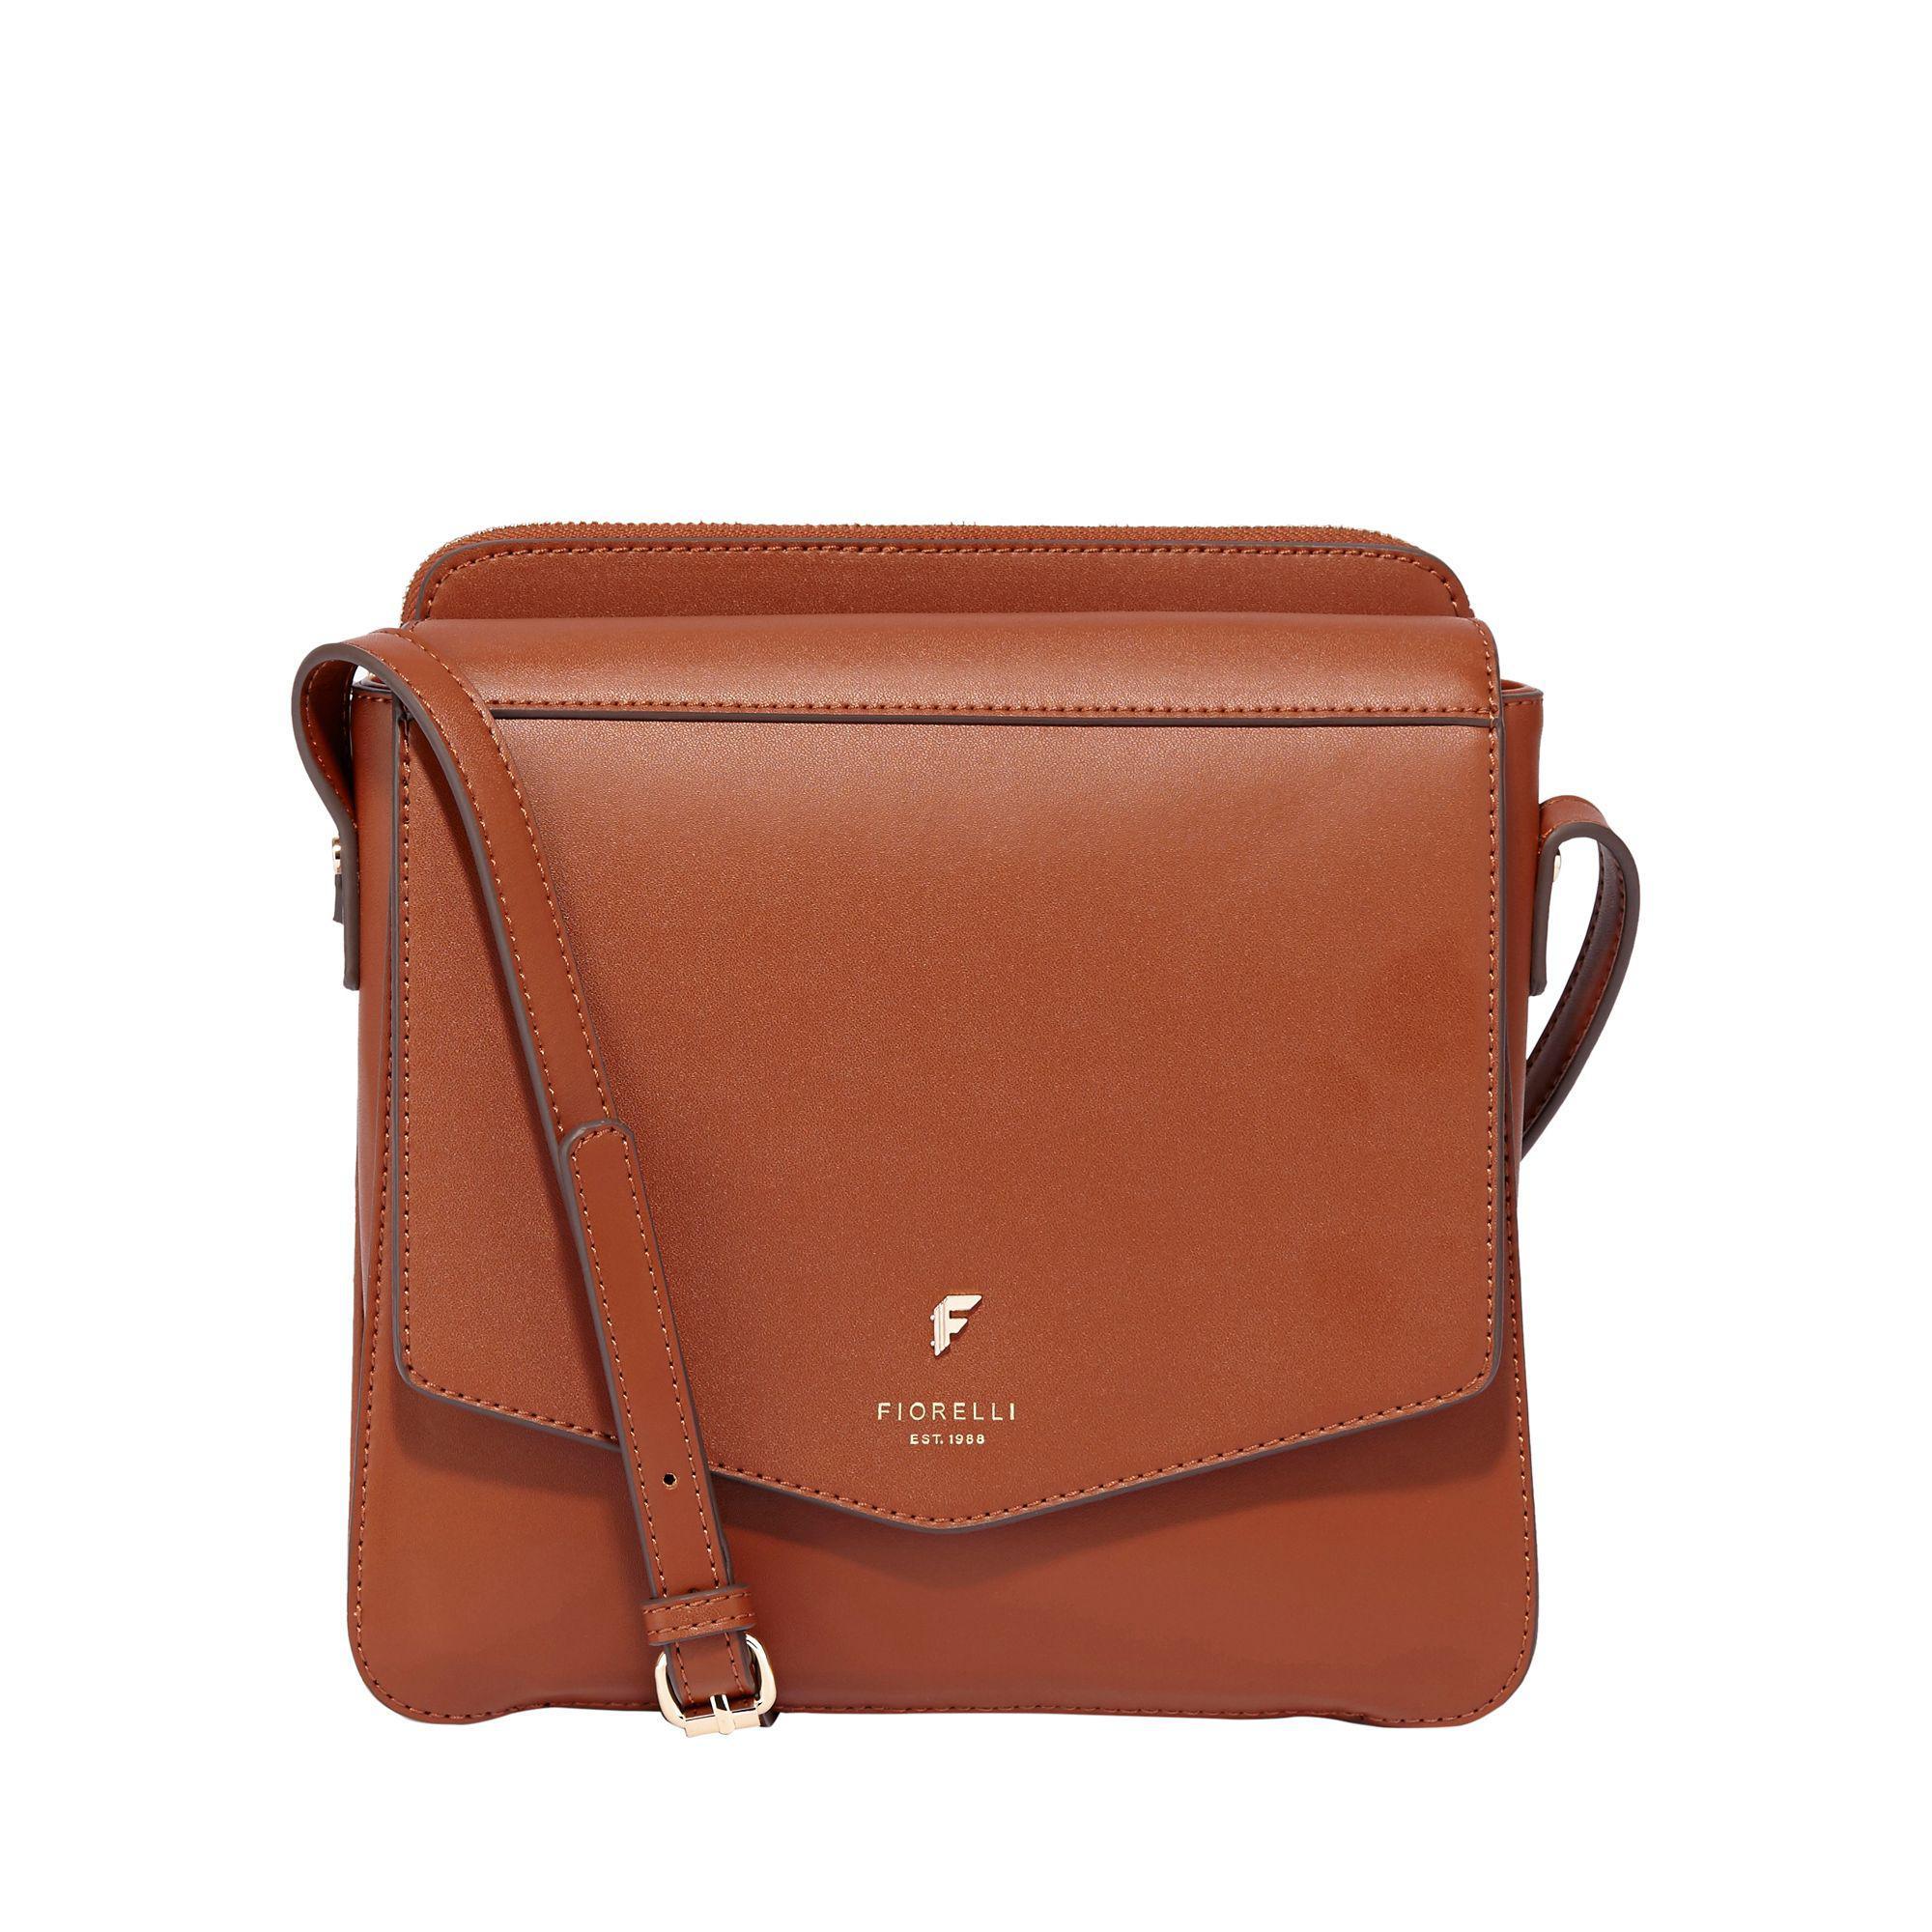 Fiorelli Brown Tan Marta Crossbody Bag Lyst View Fullscreen